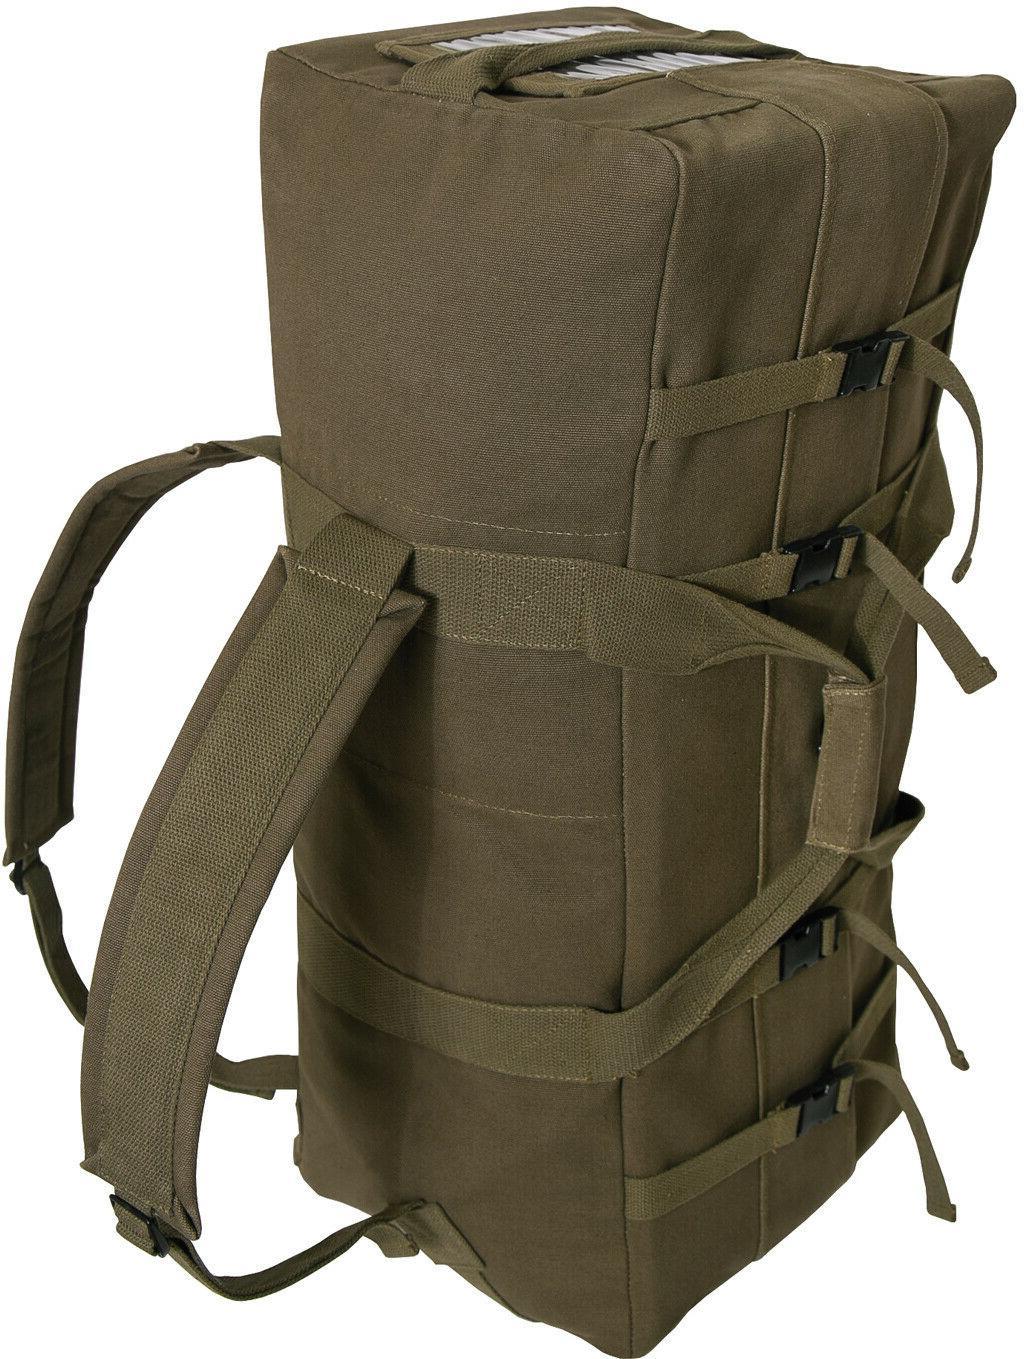 Olive Canvas Gen II Bag Strap Backpack Tactical Type Duffel